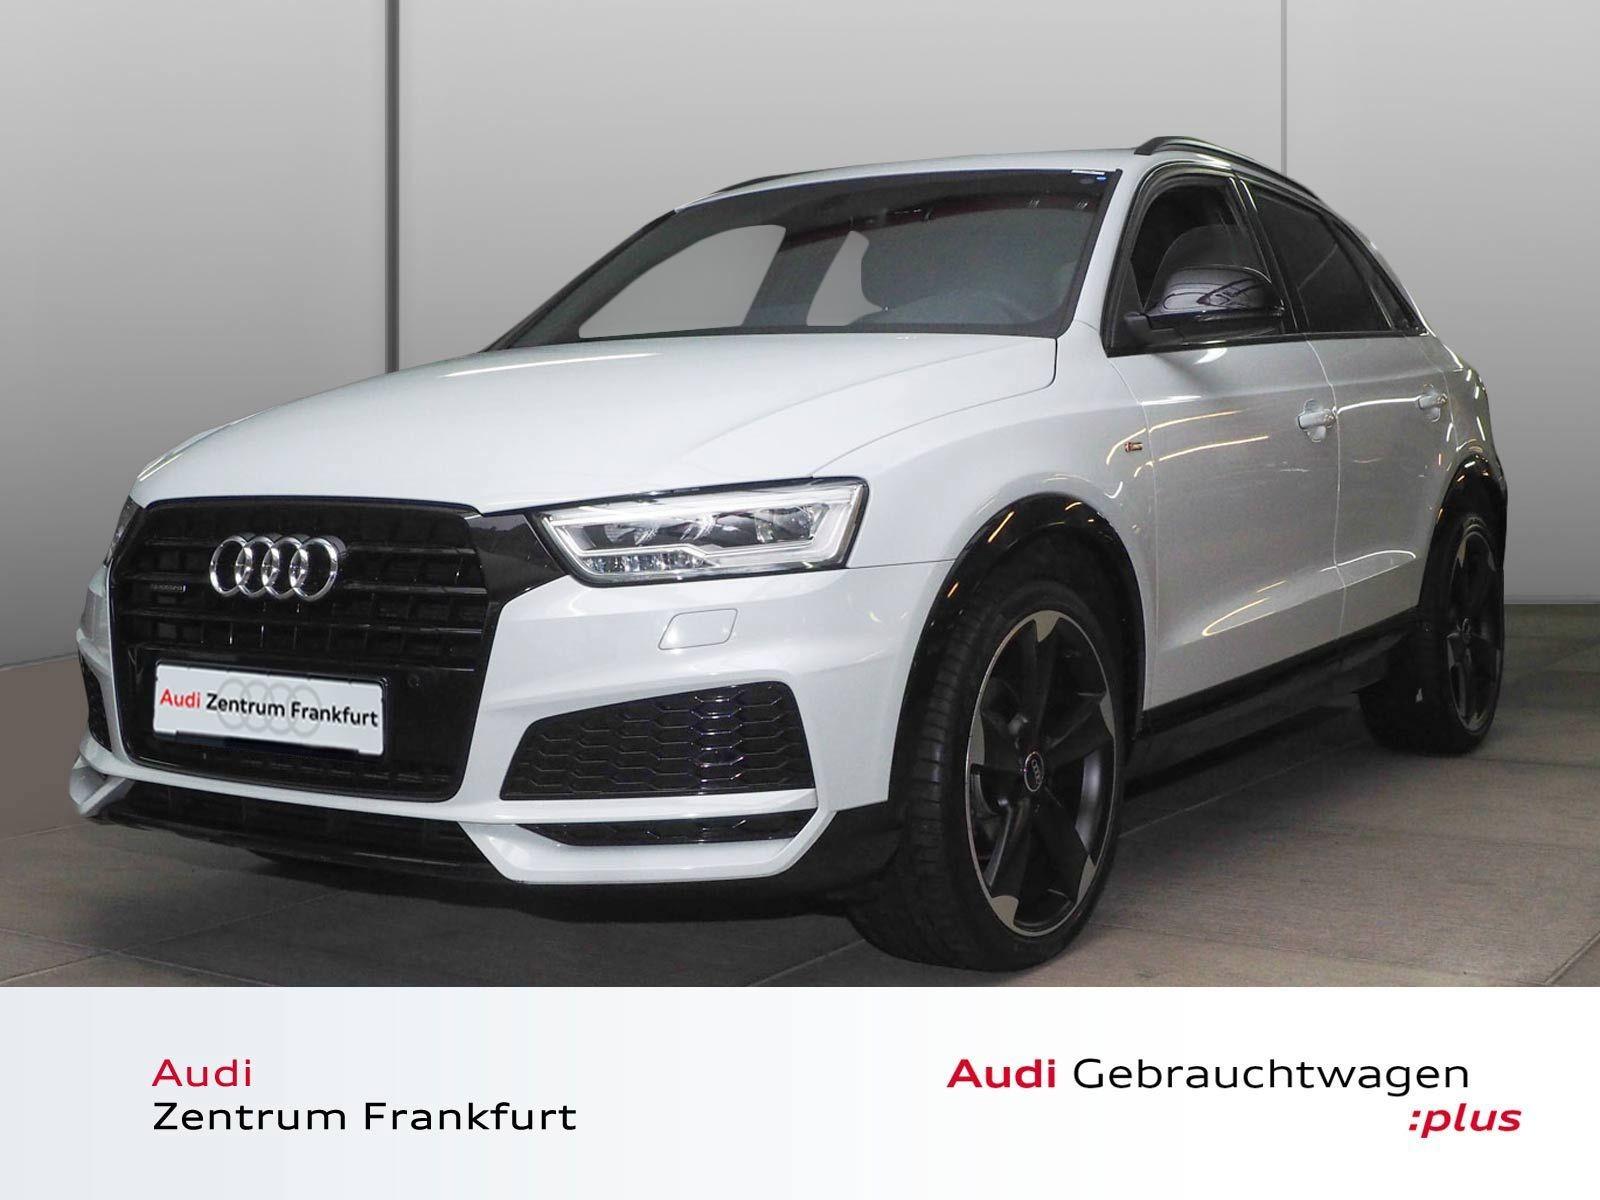 Audi Q3 2.0 TDI quattro S tronic S line LED Navi DAB Tempomat, Jahr 2017, Diesel